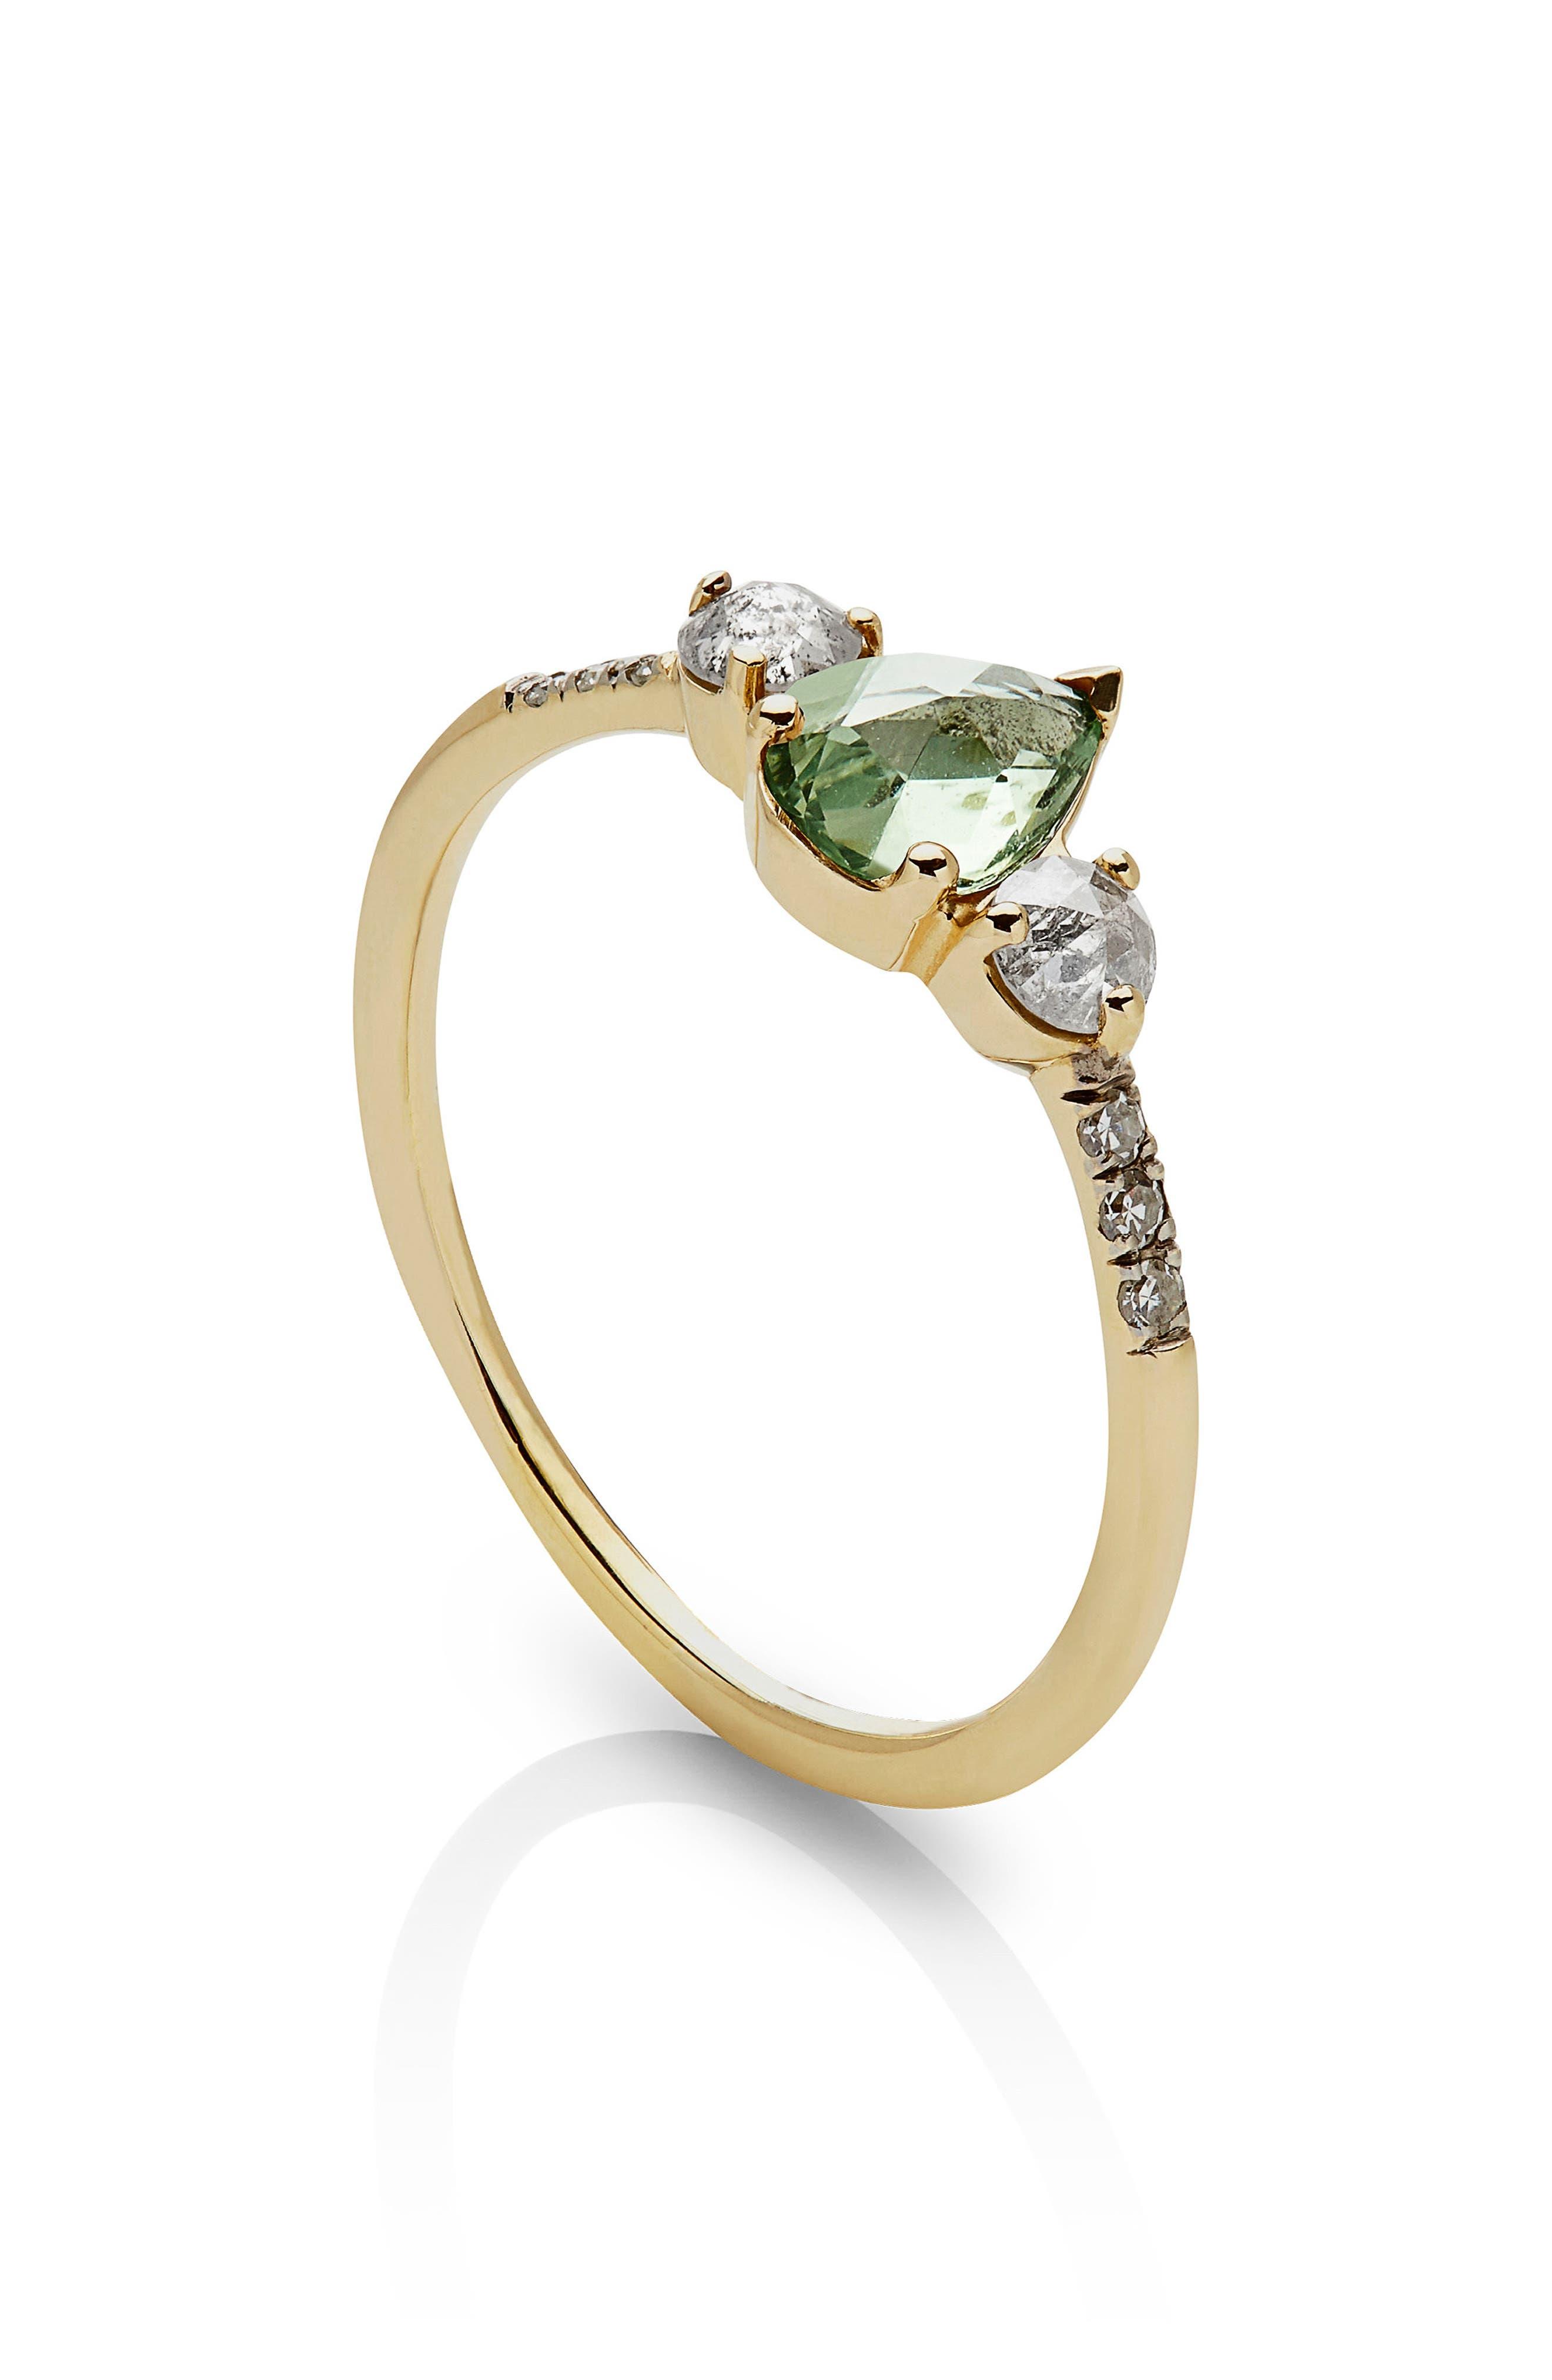 Radiance Sapphire & Diamond Ring,                             Alternate thumbnail 2, color,                             YELLOW GOLD/ GREEN SAPPHIRE